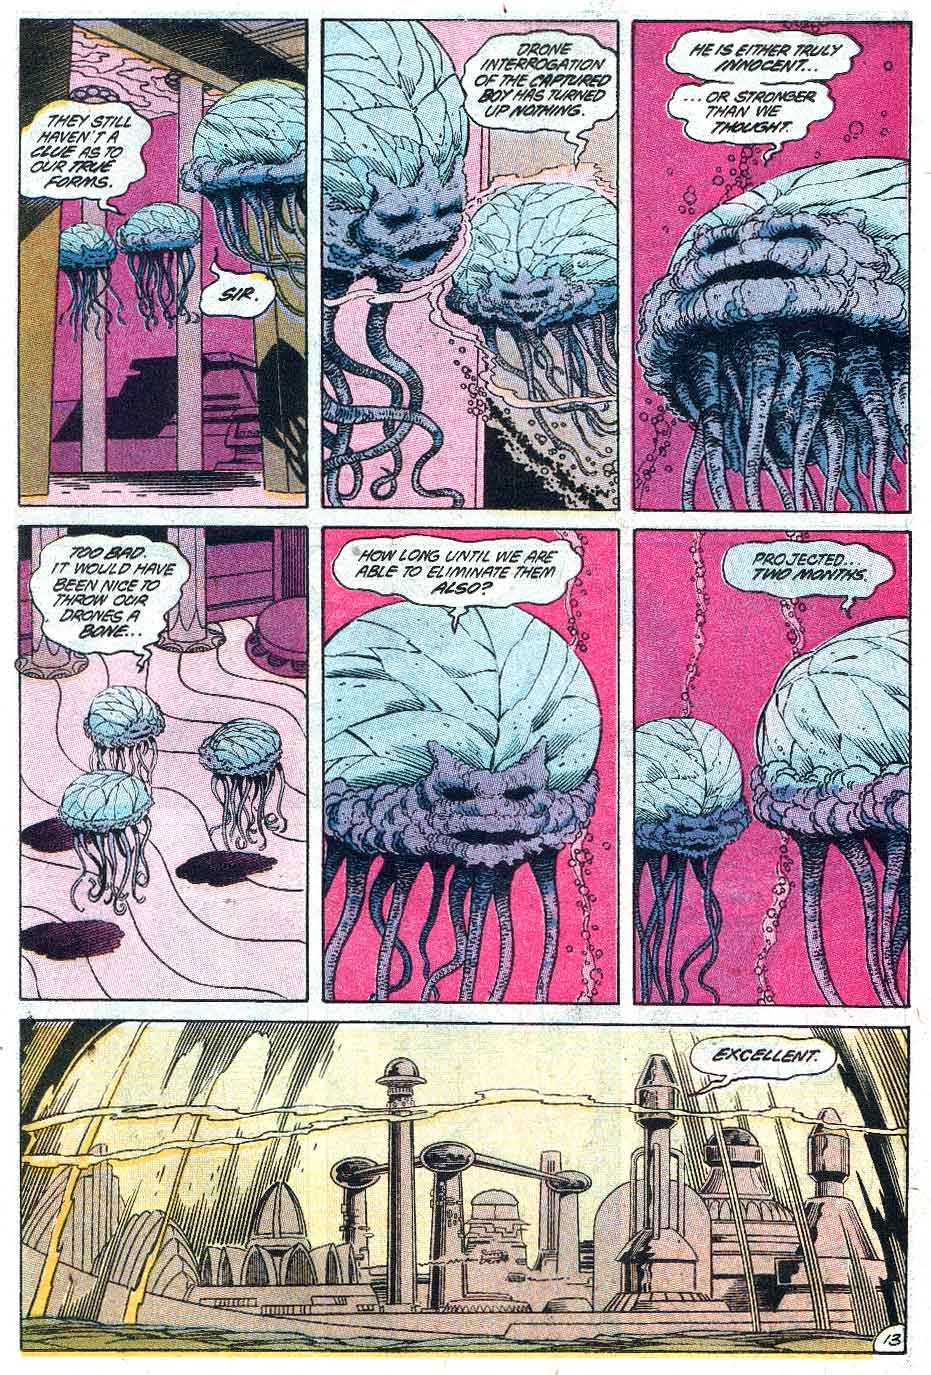 Aquaman (1989) 2 Page 13